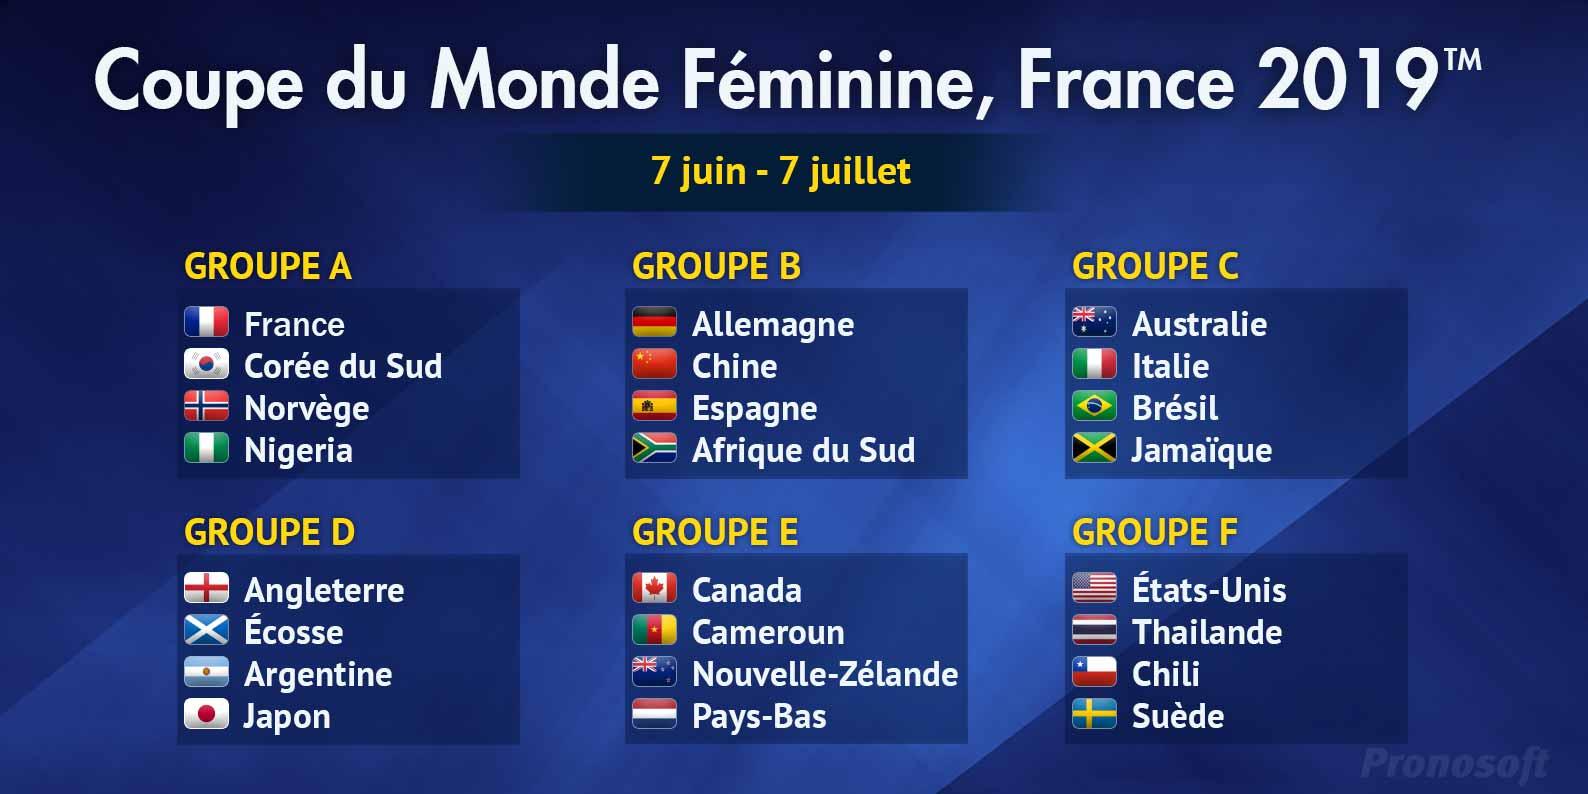 Coupe Du Monde Feminine 2019 Calendrier Stade.Coupe Du Monde Feminine 2019 En France